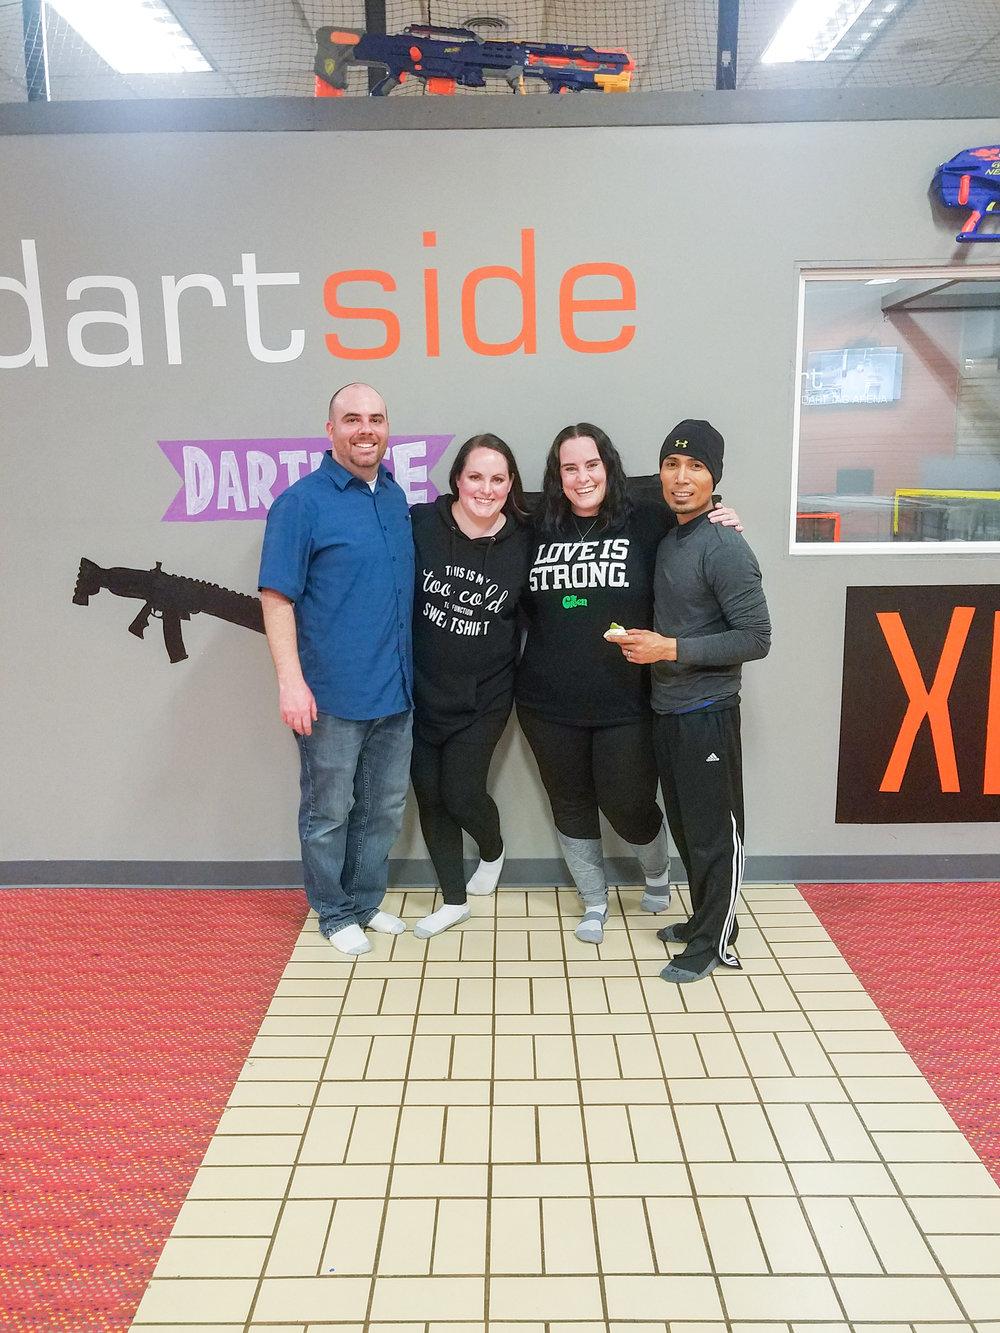 group dates at dartside layton hills mall